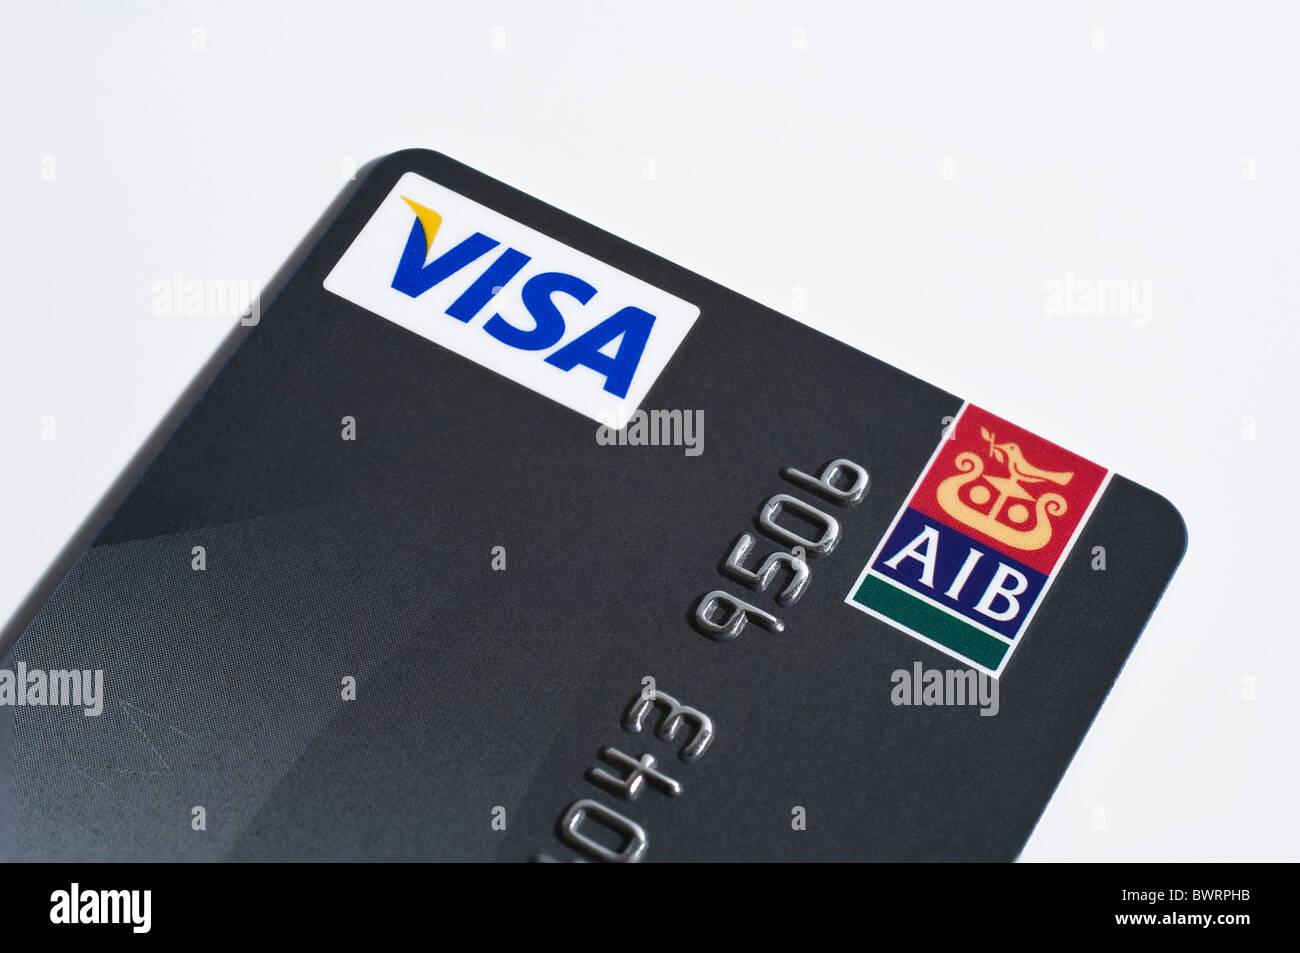 Detail einer Allied Irish Bank Platin Visa Kreditkarte Stockbild